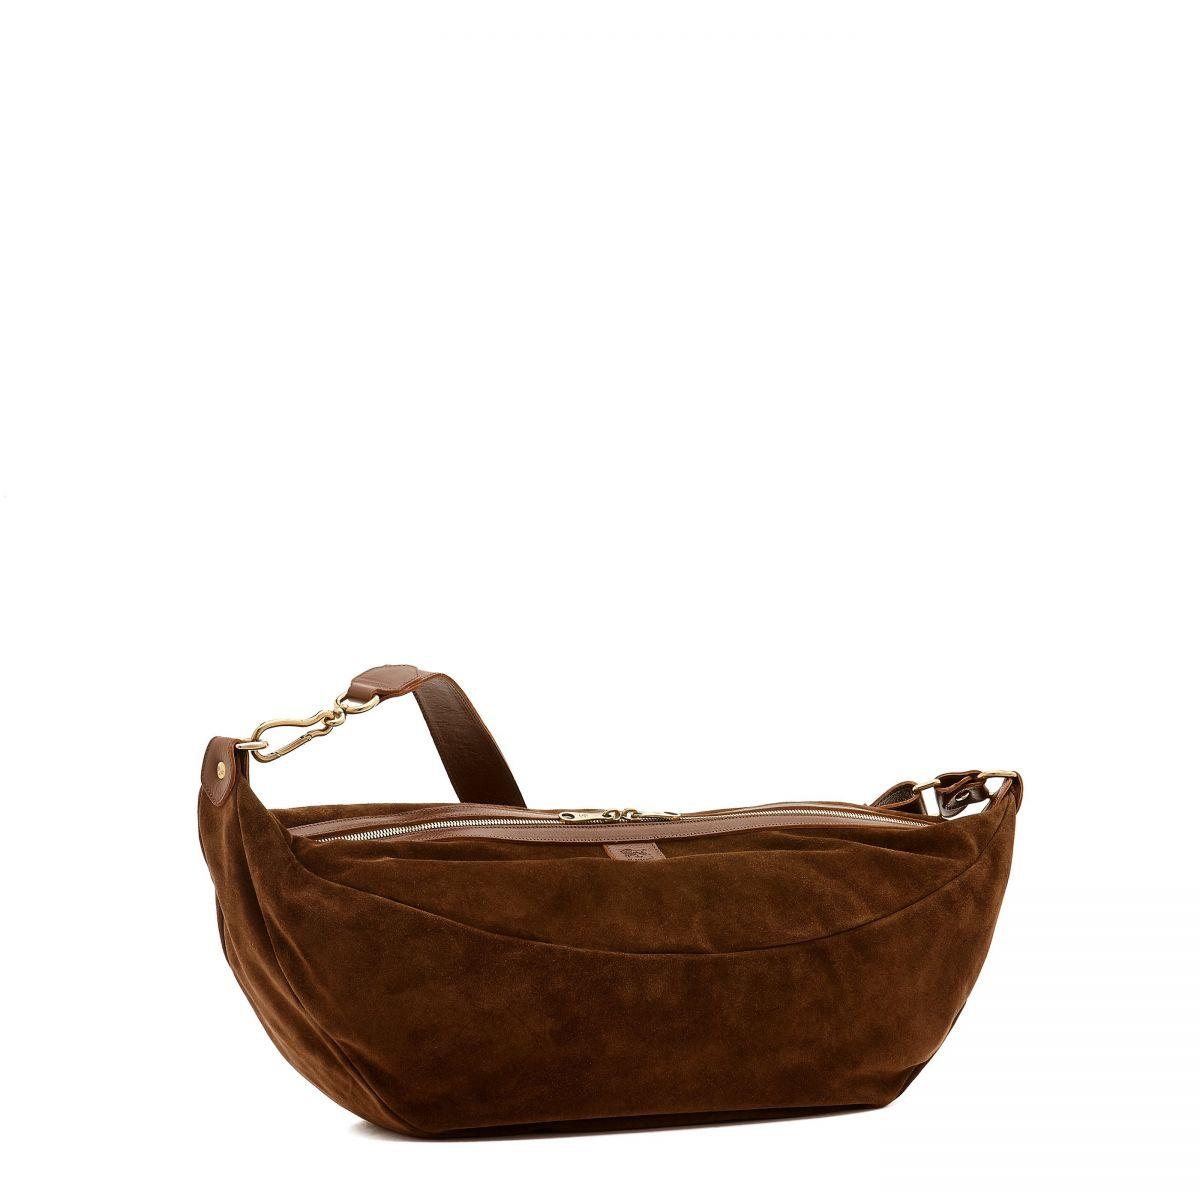 Women's Crossbody Bag  in Suede BCR153 color Brown | Details